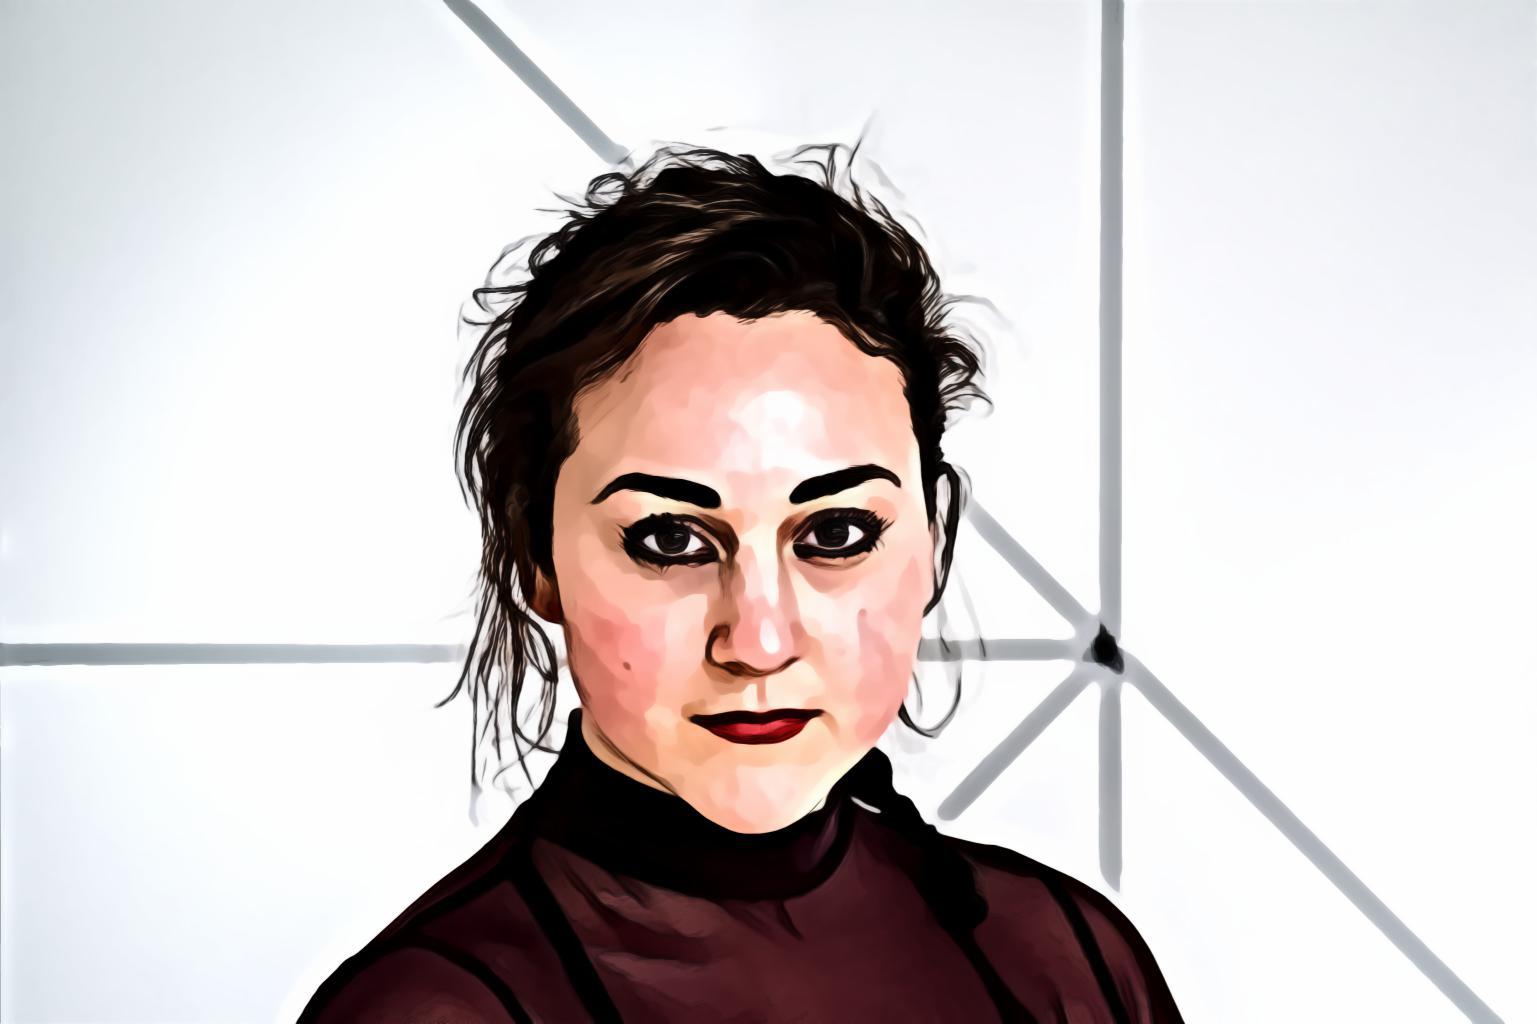 Woman in maroon turtleneck shirt